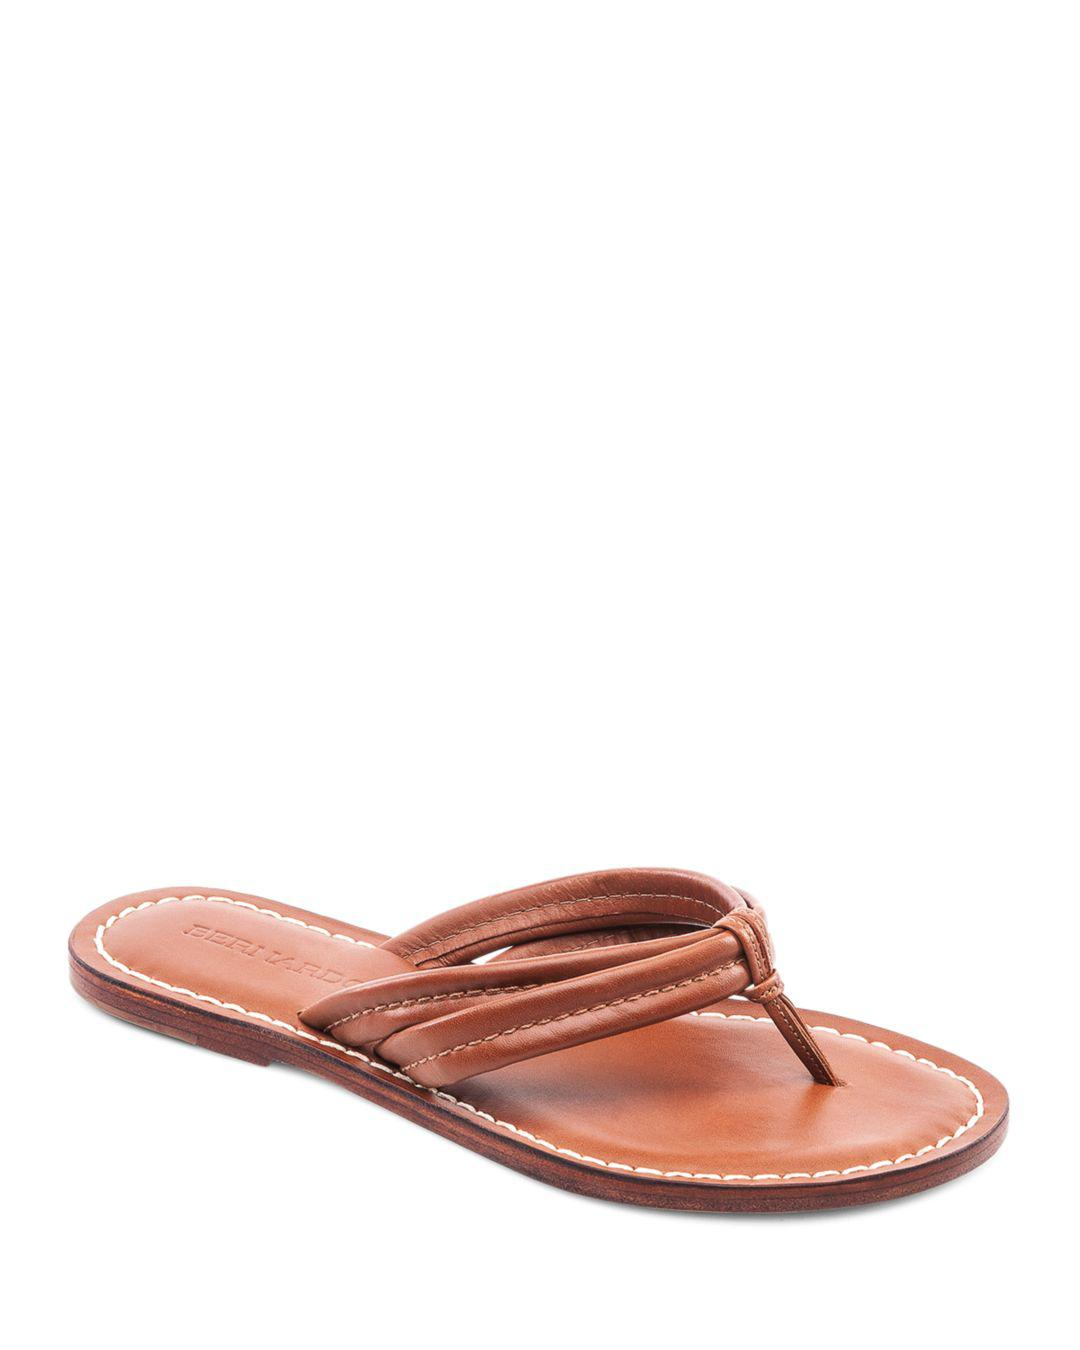 b657a0e78958 Bernardo Miami Two Strap Thong Sandals - Save 34% - Lyst